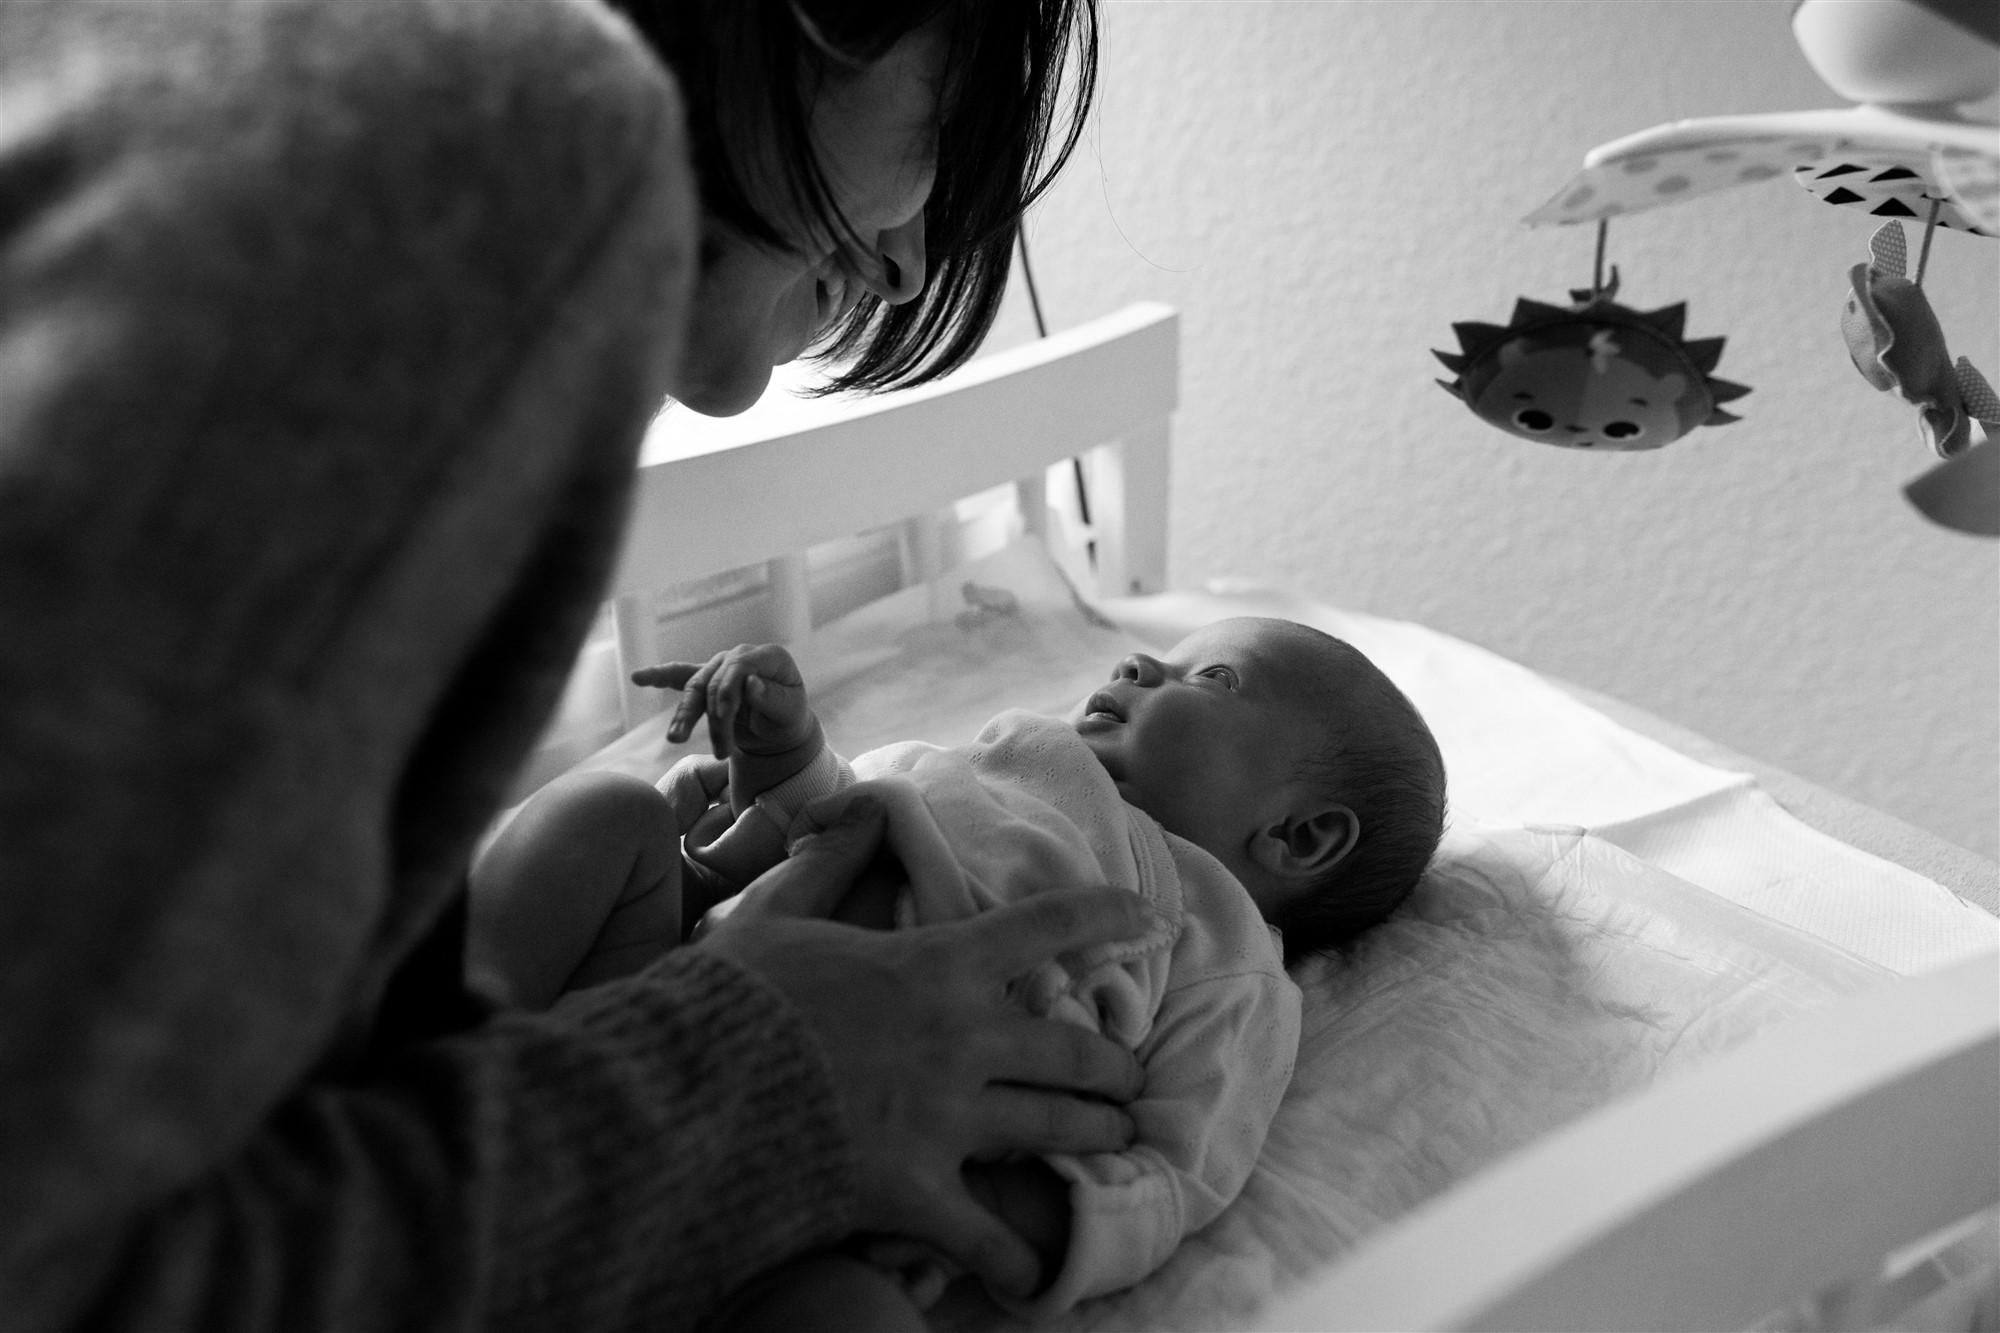 Newborn Homestory Fotoshooting - Die Mama wickelt ihr Baby